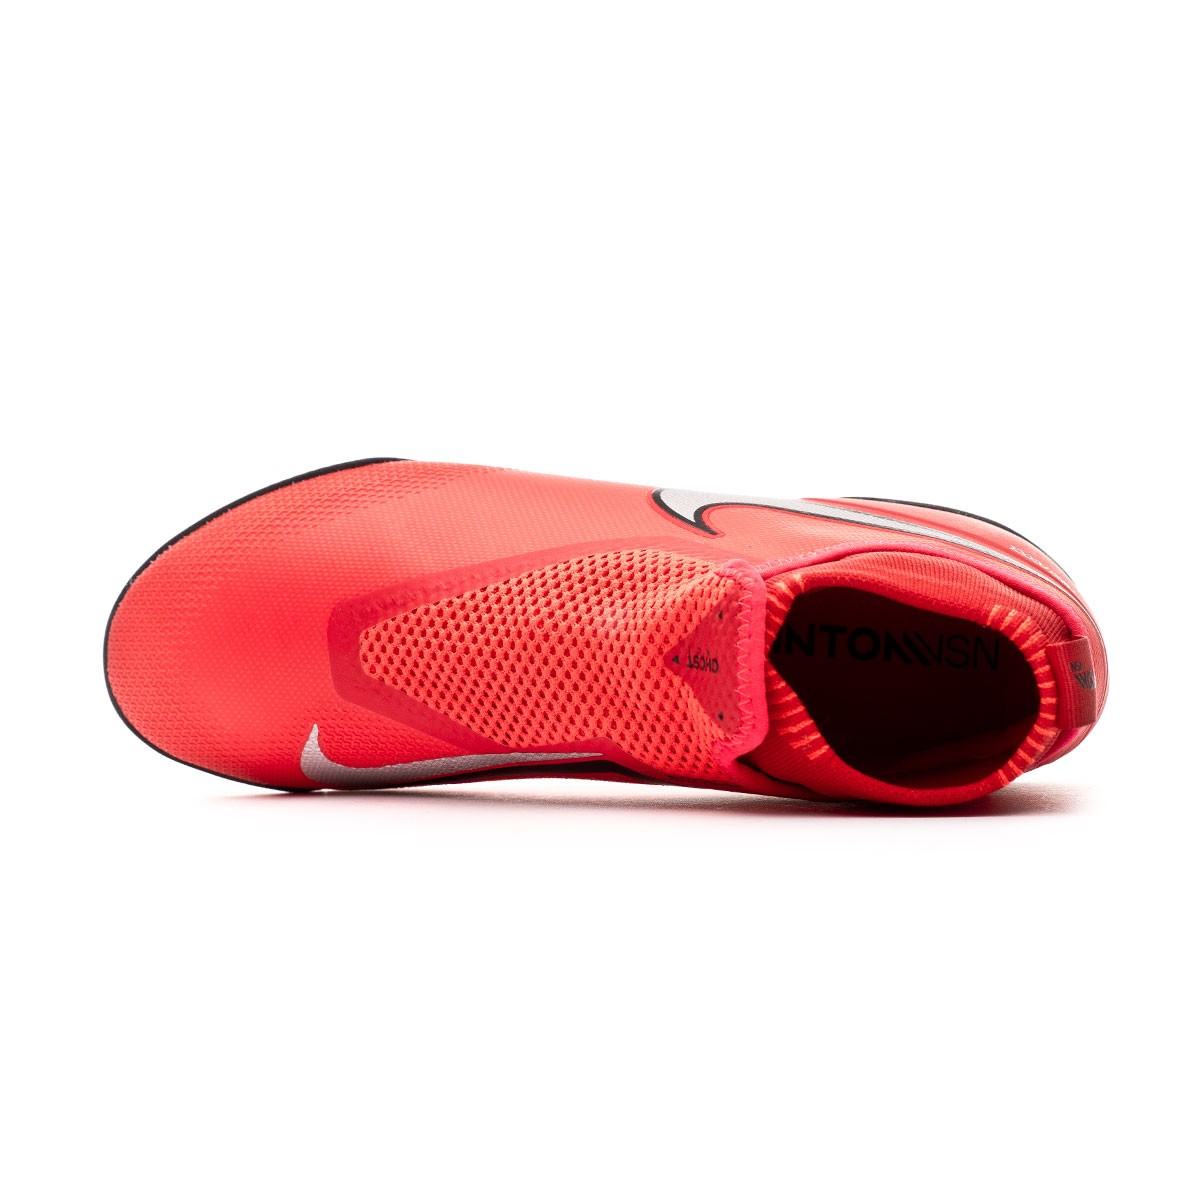 cc90bcf8b95 Football Boot Nike React Phantom Vision Pro DF Turf Bright crimson-Metallic  silver - Football store Fútbol Emotion